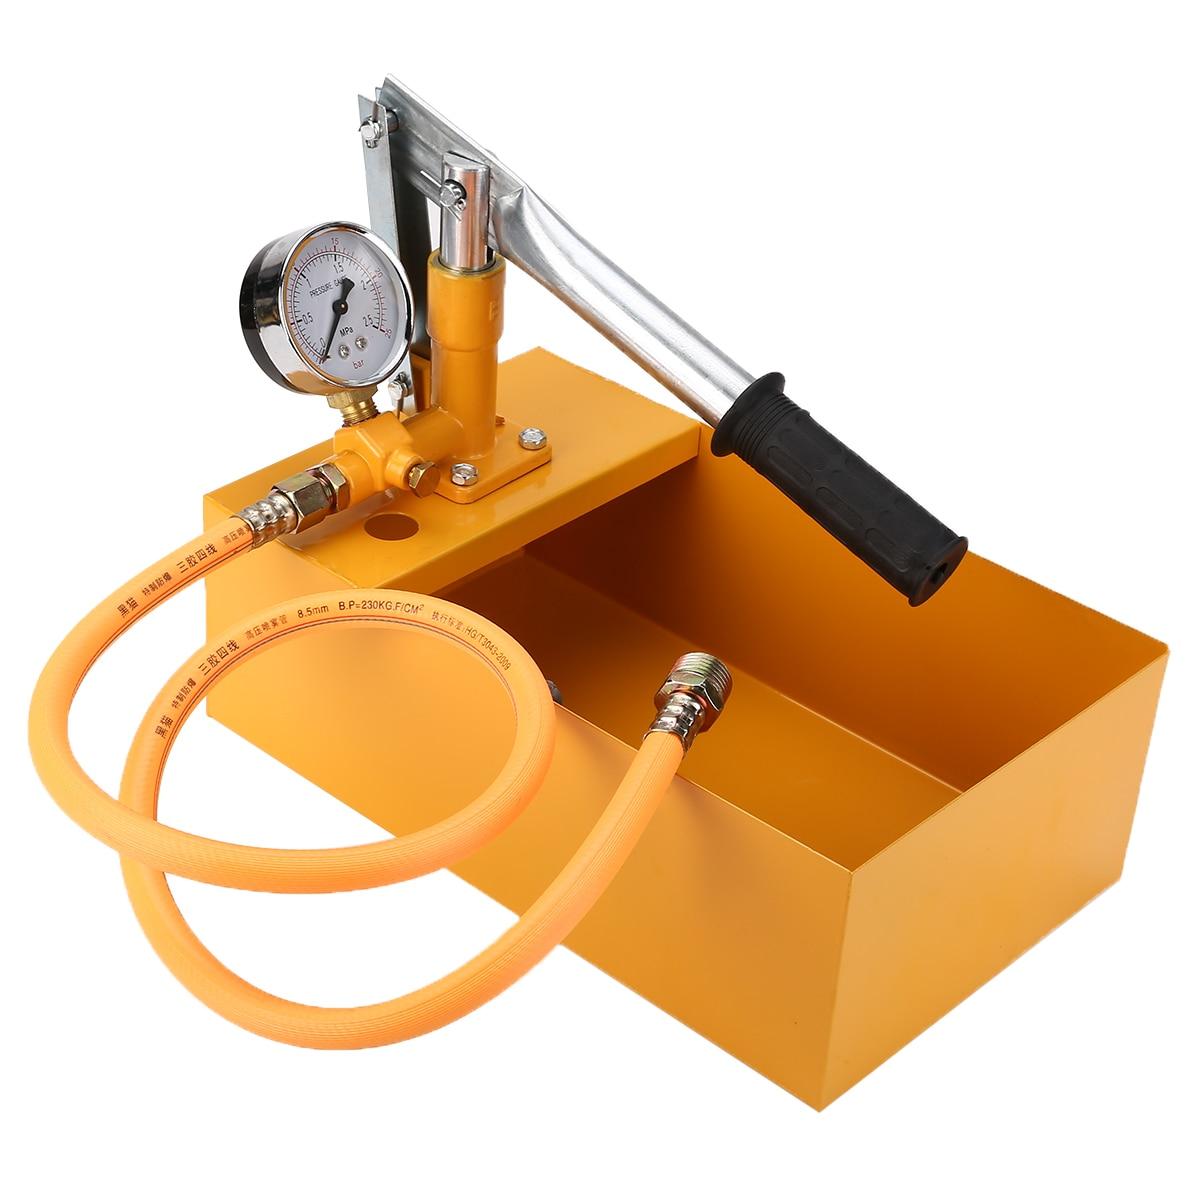 1 Set Yellow Water Pressure Tester 2.5MPa Pipeline Tester 25KG Manual Hydraulic Water Pressure Test Pipeline Tester Pump Machine